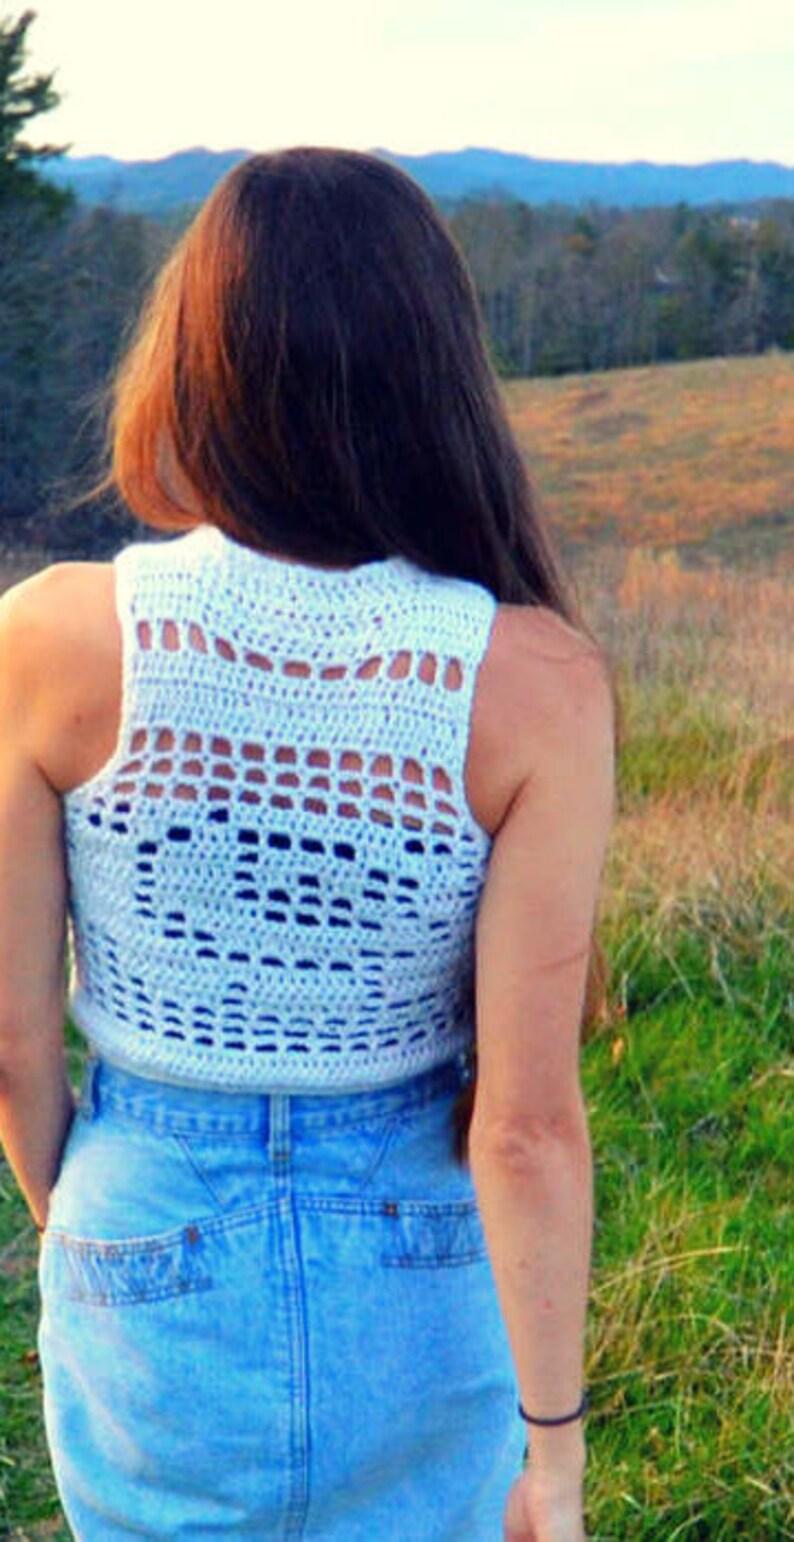 Crochet crop top crew neck pattern Existence image 1